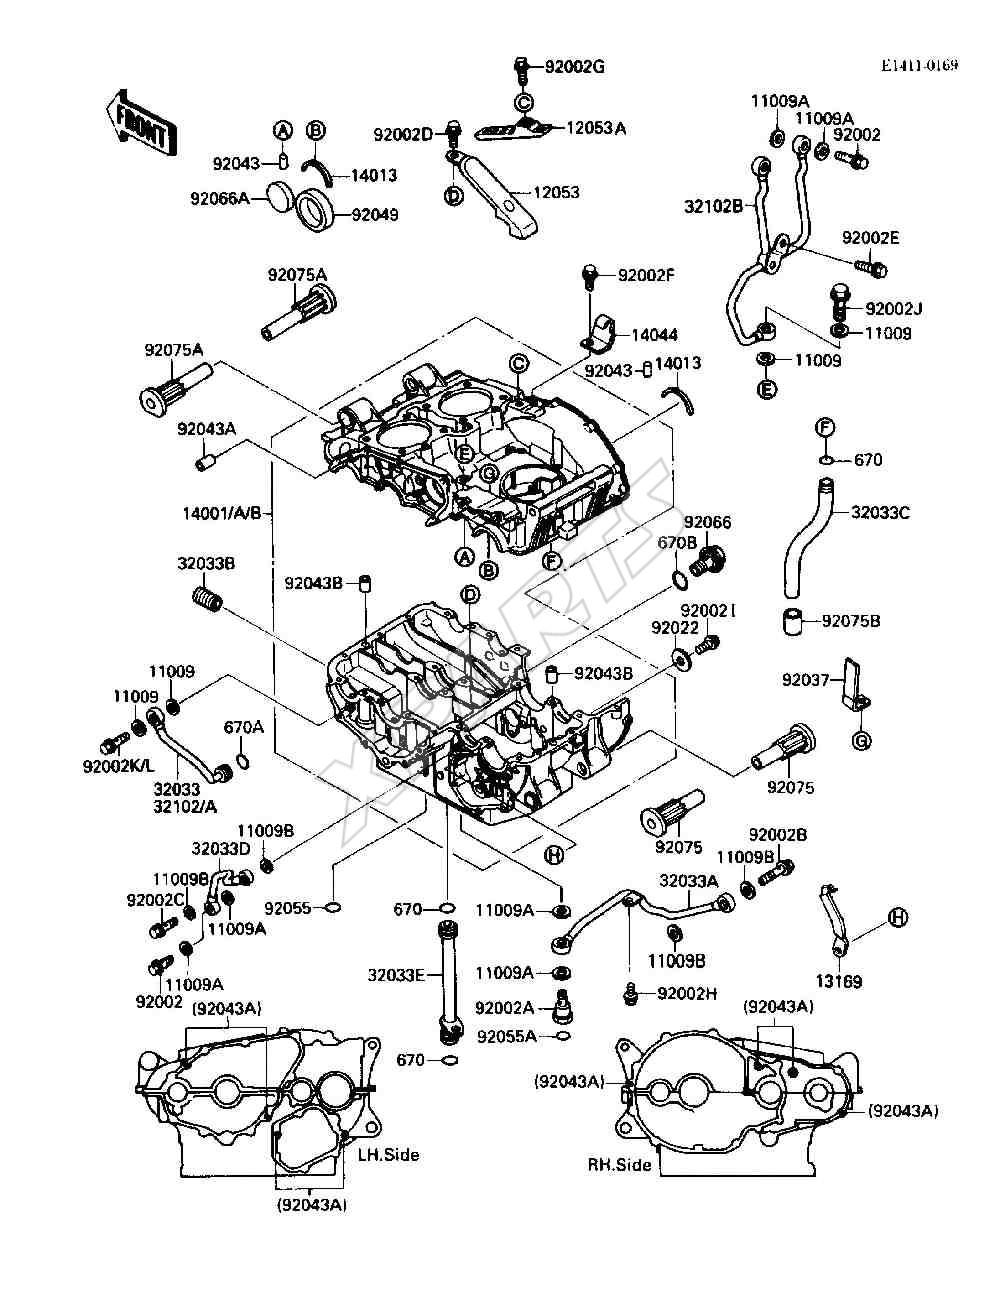 Kawasaki 454 LTD (EN450-A2) Crankcase (1986)